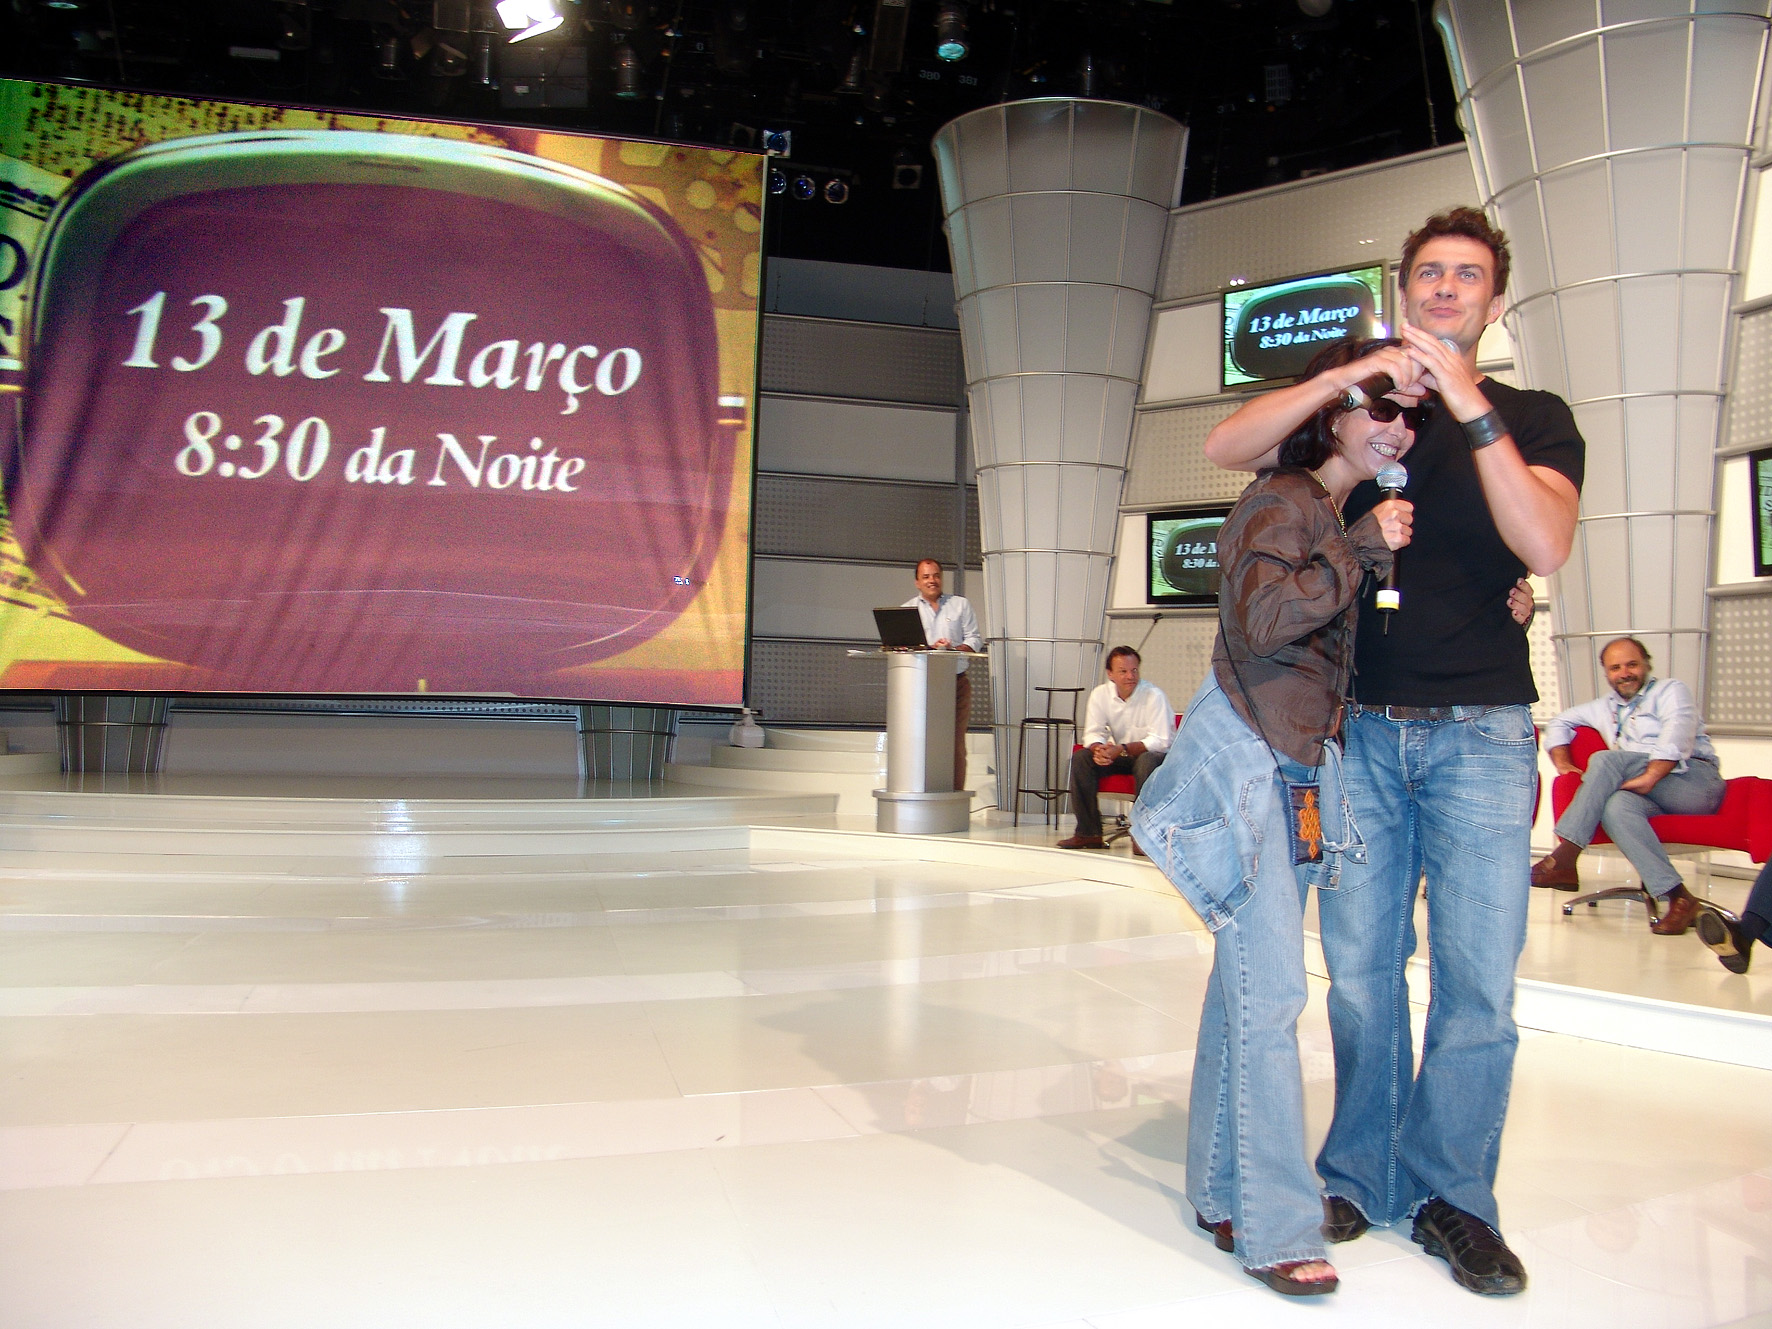 http://upload.wikimedia.org/wikipedia/commons/2/2f/Lucelia_Santos_e_Gabriel_Braga_Nunes.jpg